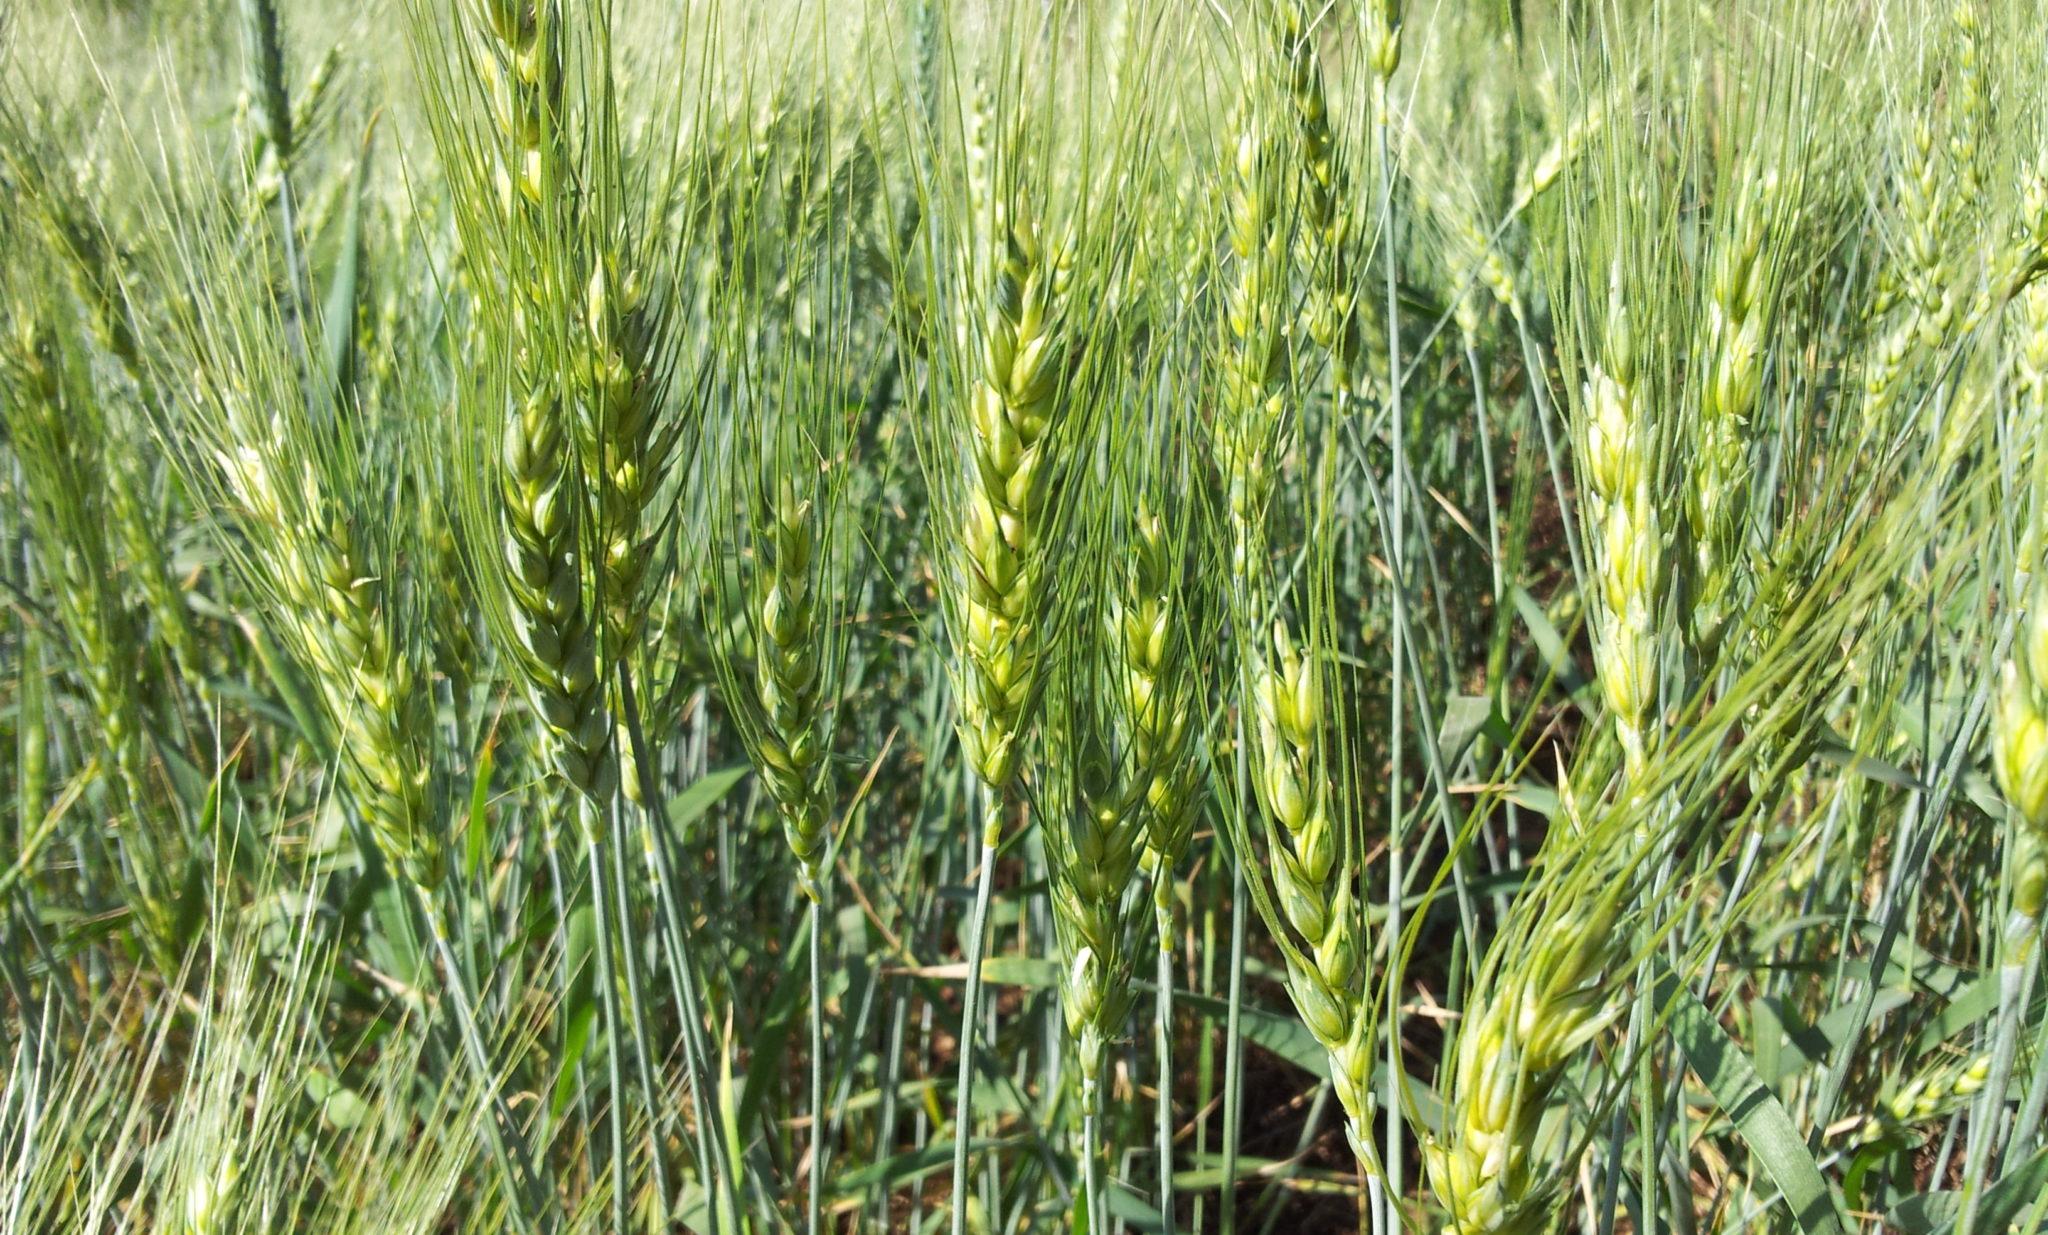 Young_Wheat_crop_in_a_field_near_Solapur,_Maharashtra,_India